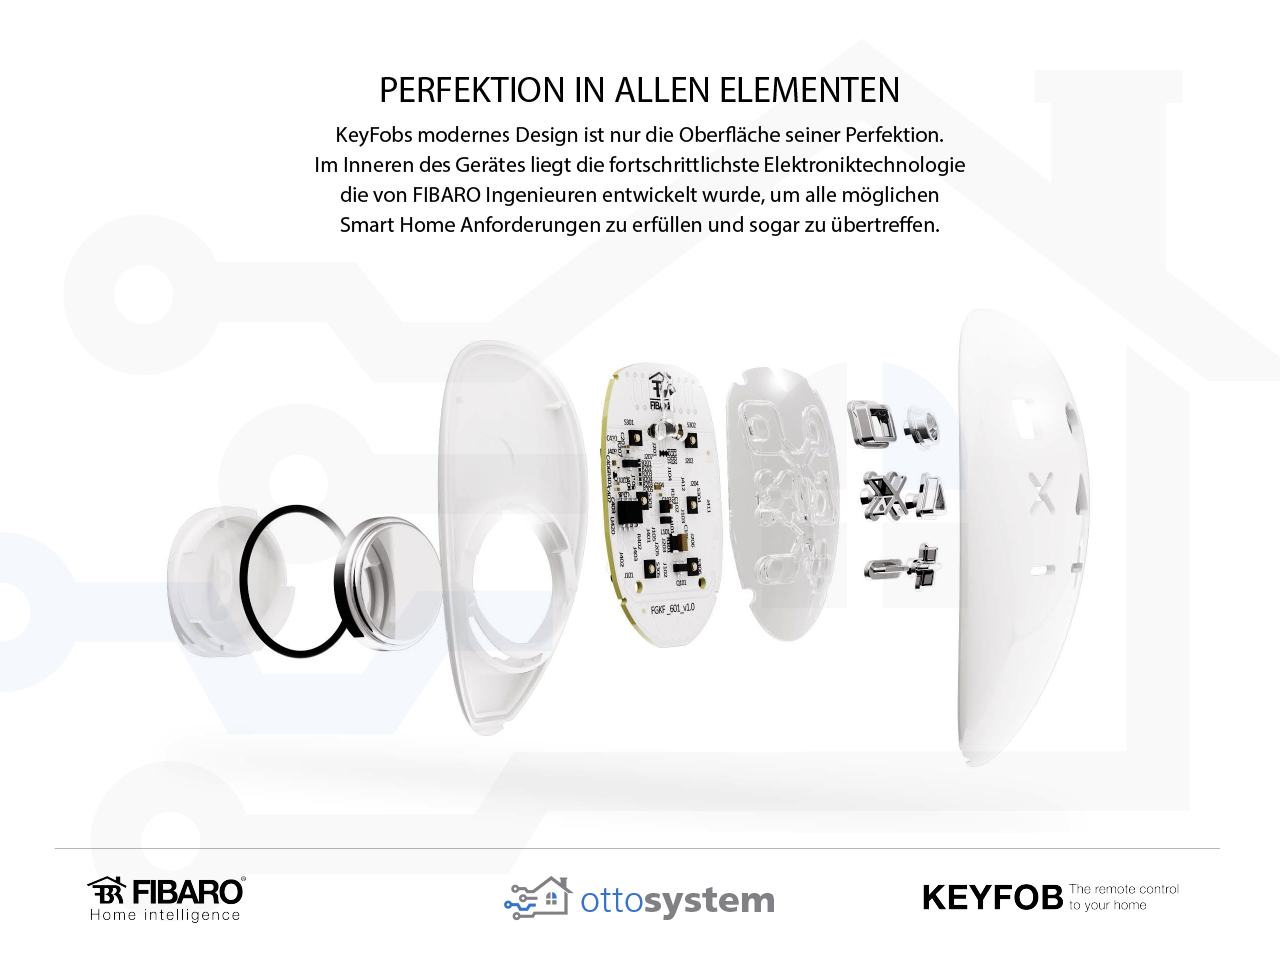 Pr-sentation_FIBARO_KeyFob_ottosystem-3